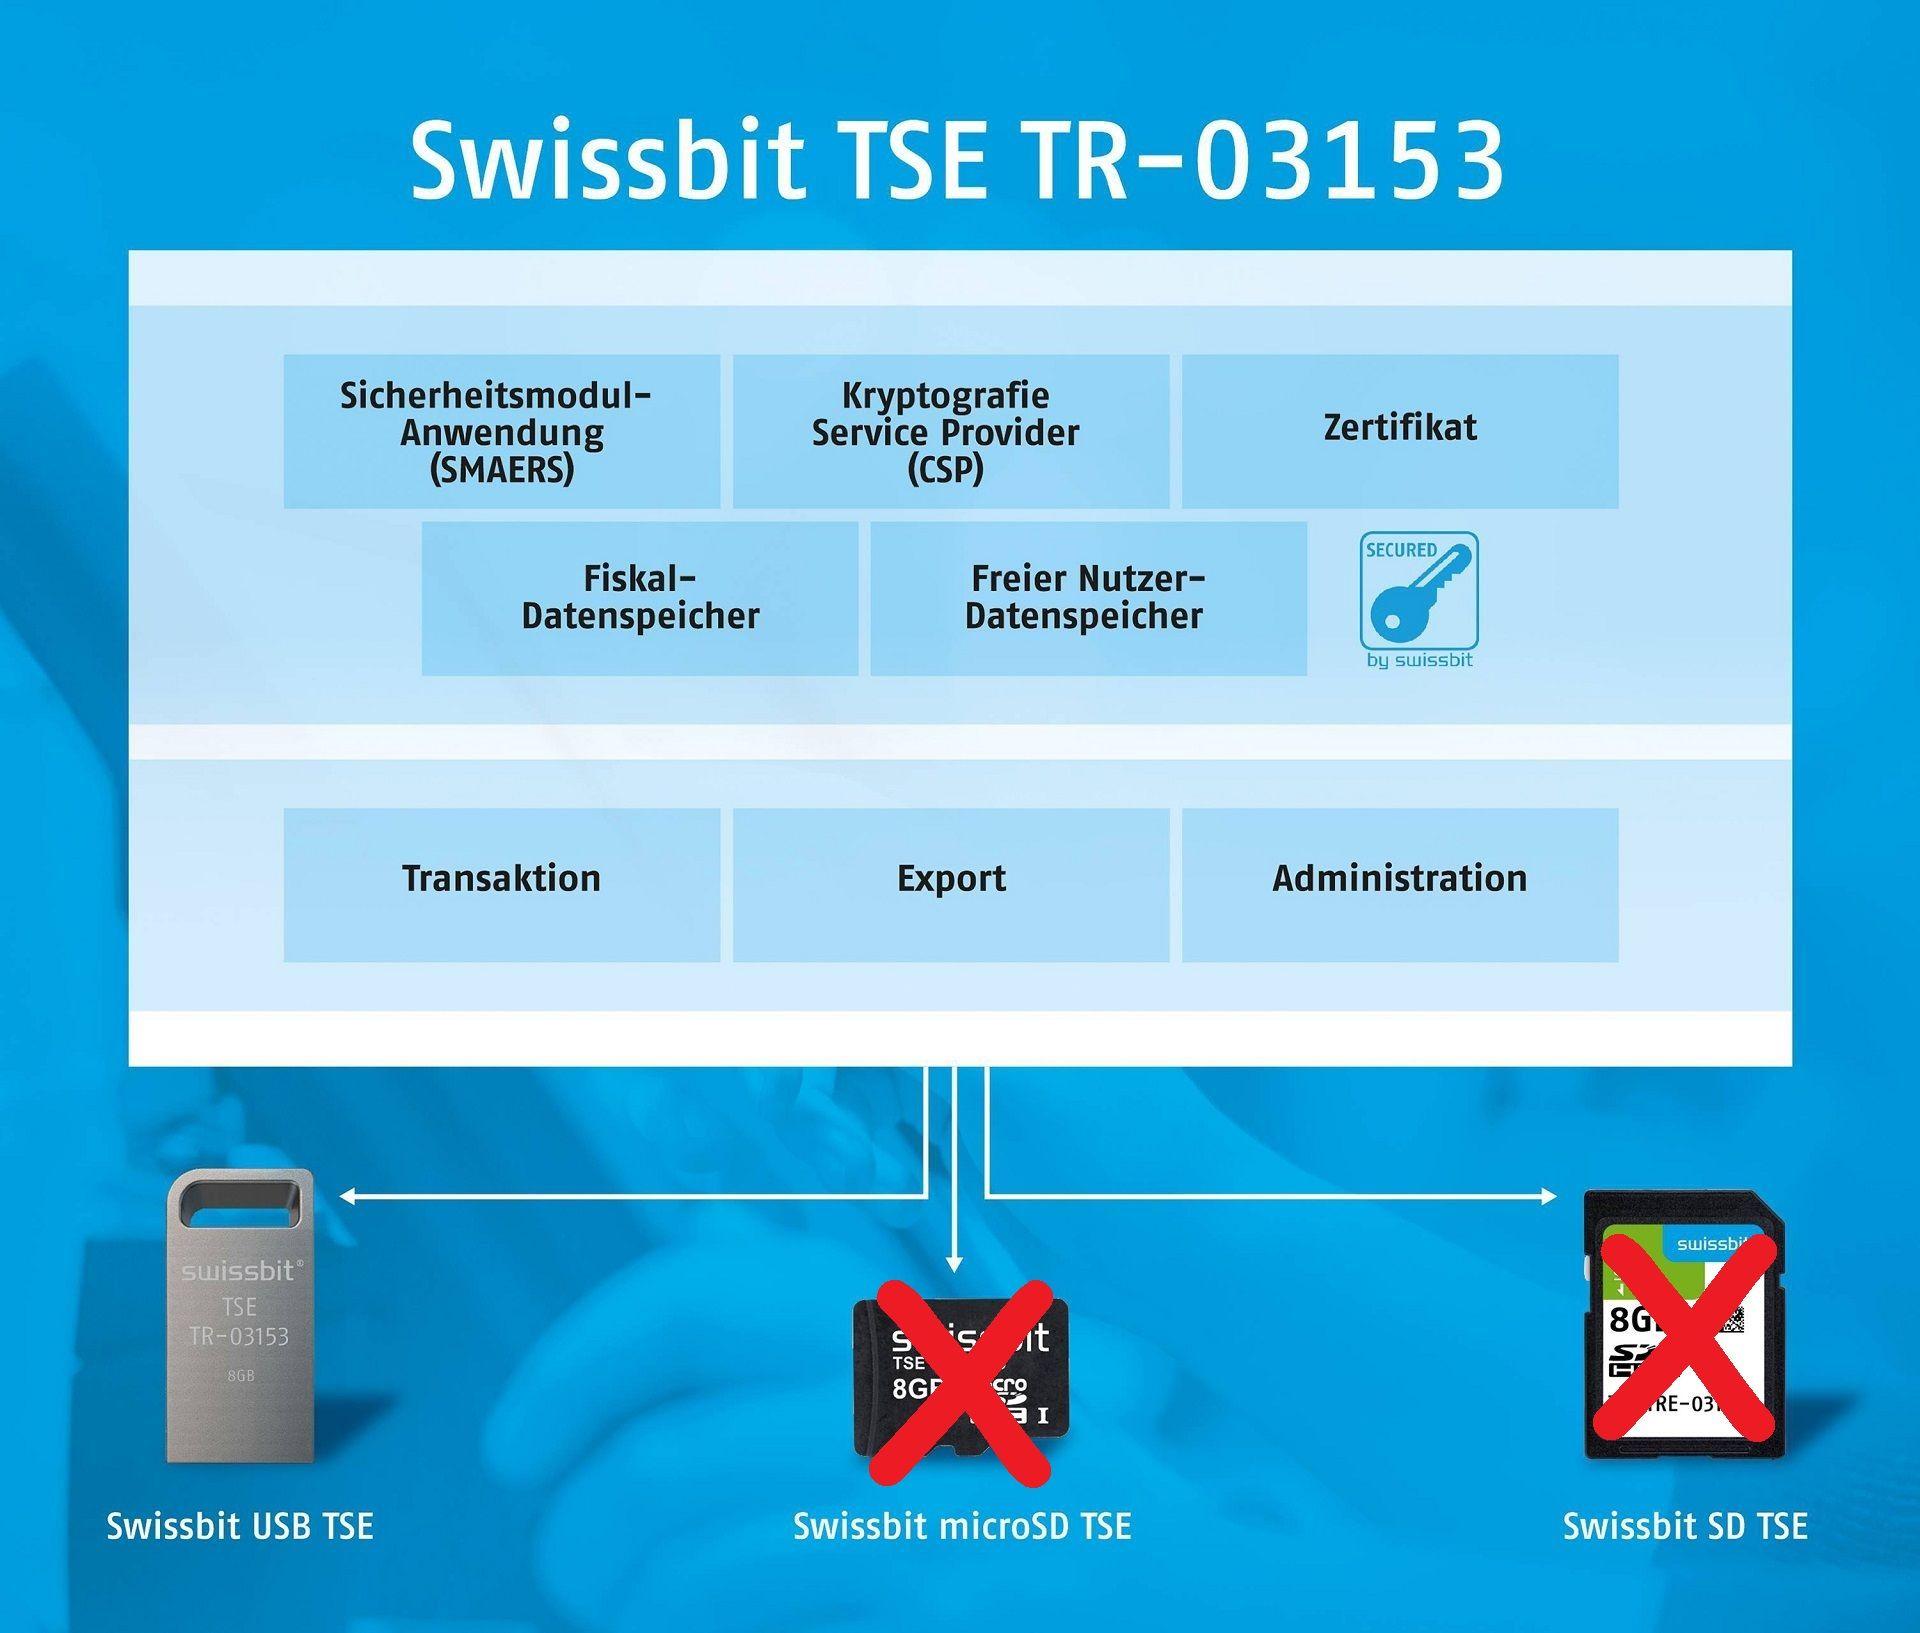 Swissbit TSE-Einheit als USB-Stick